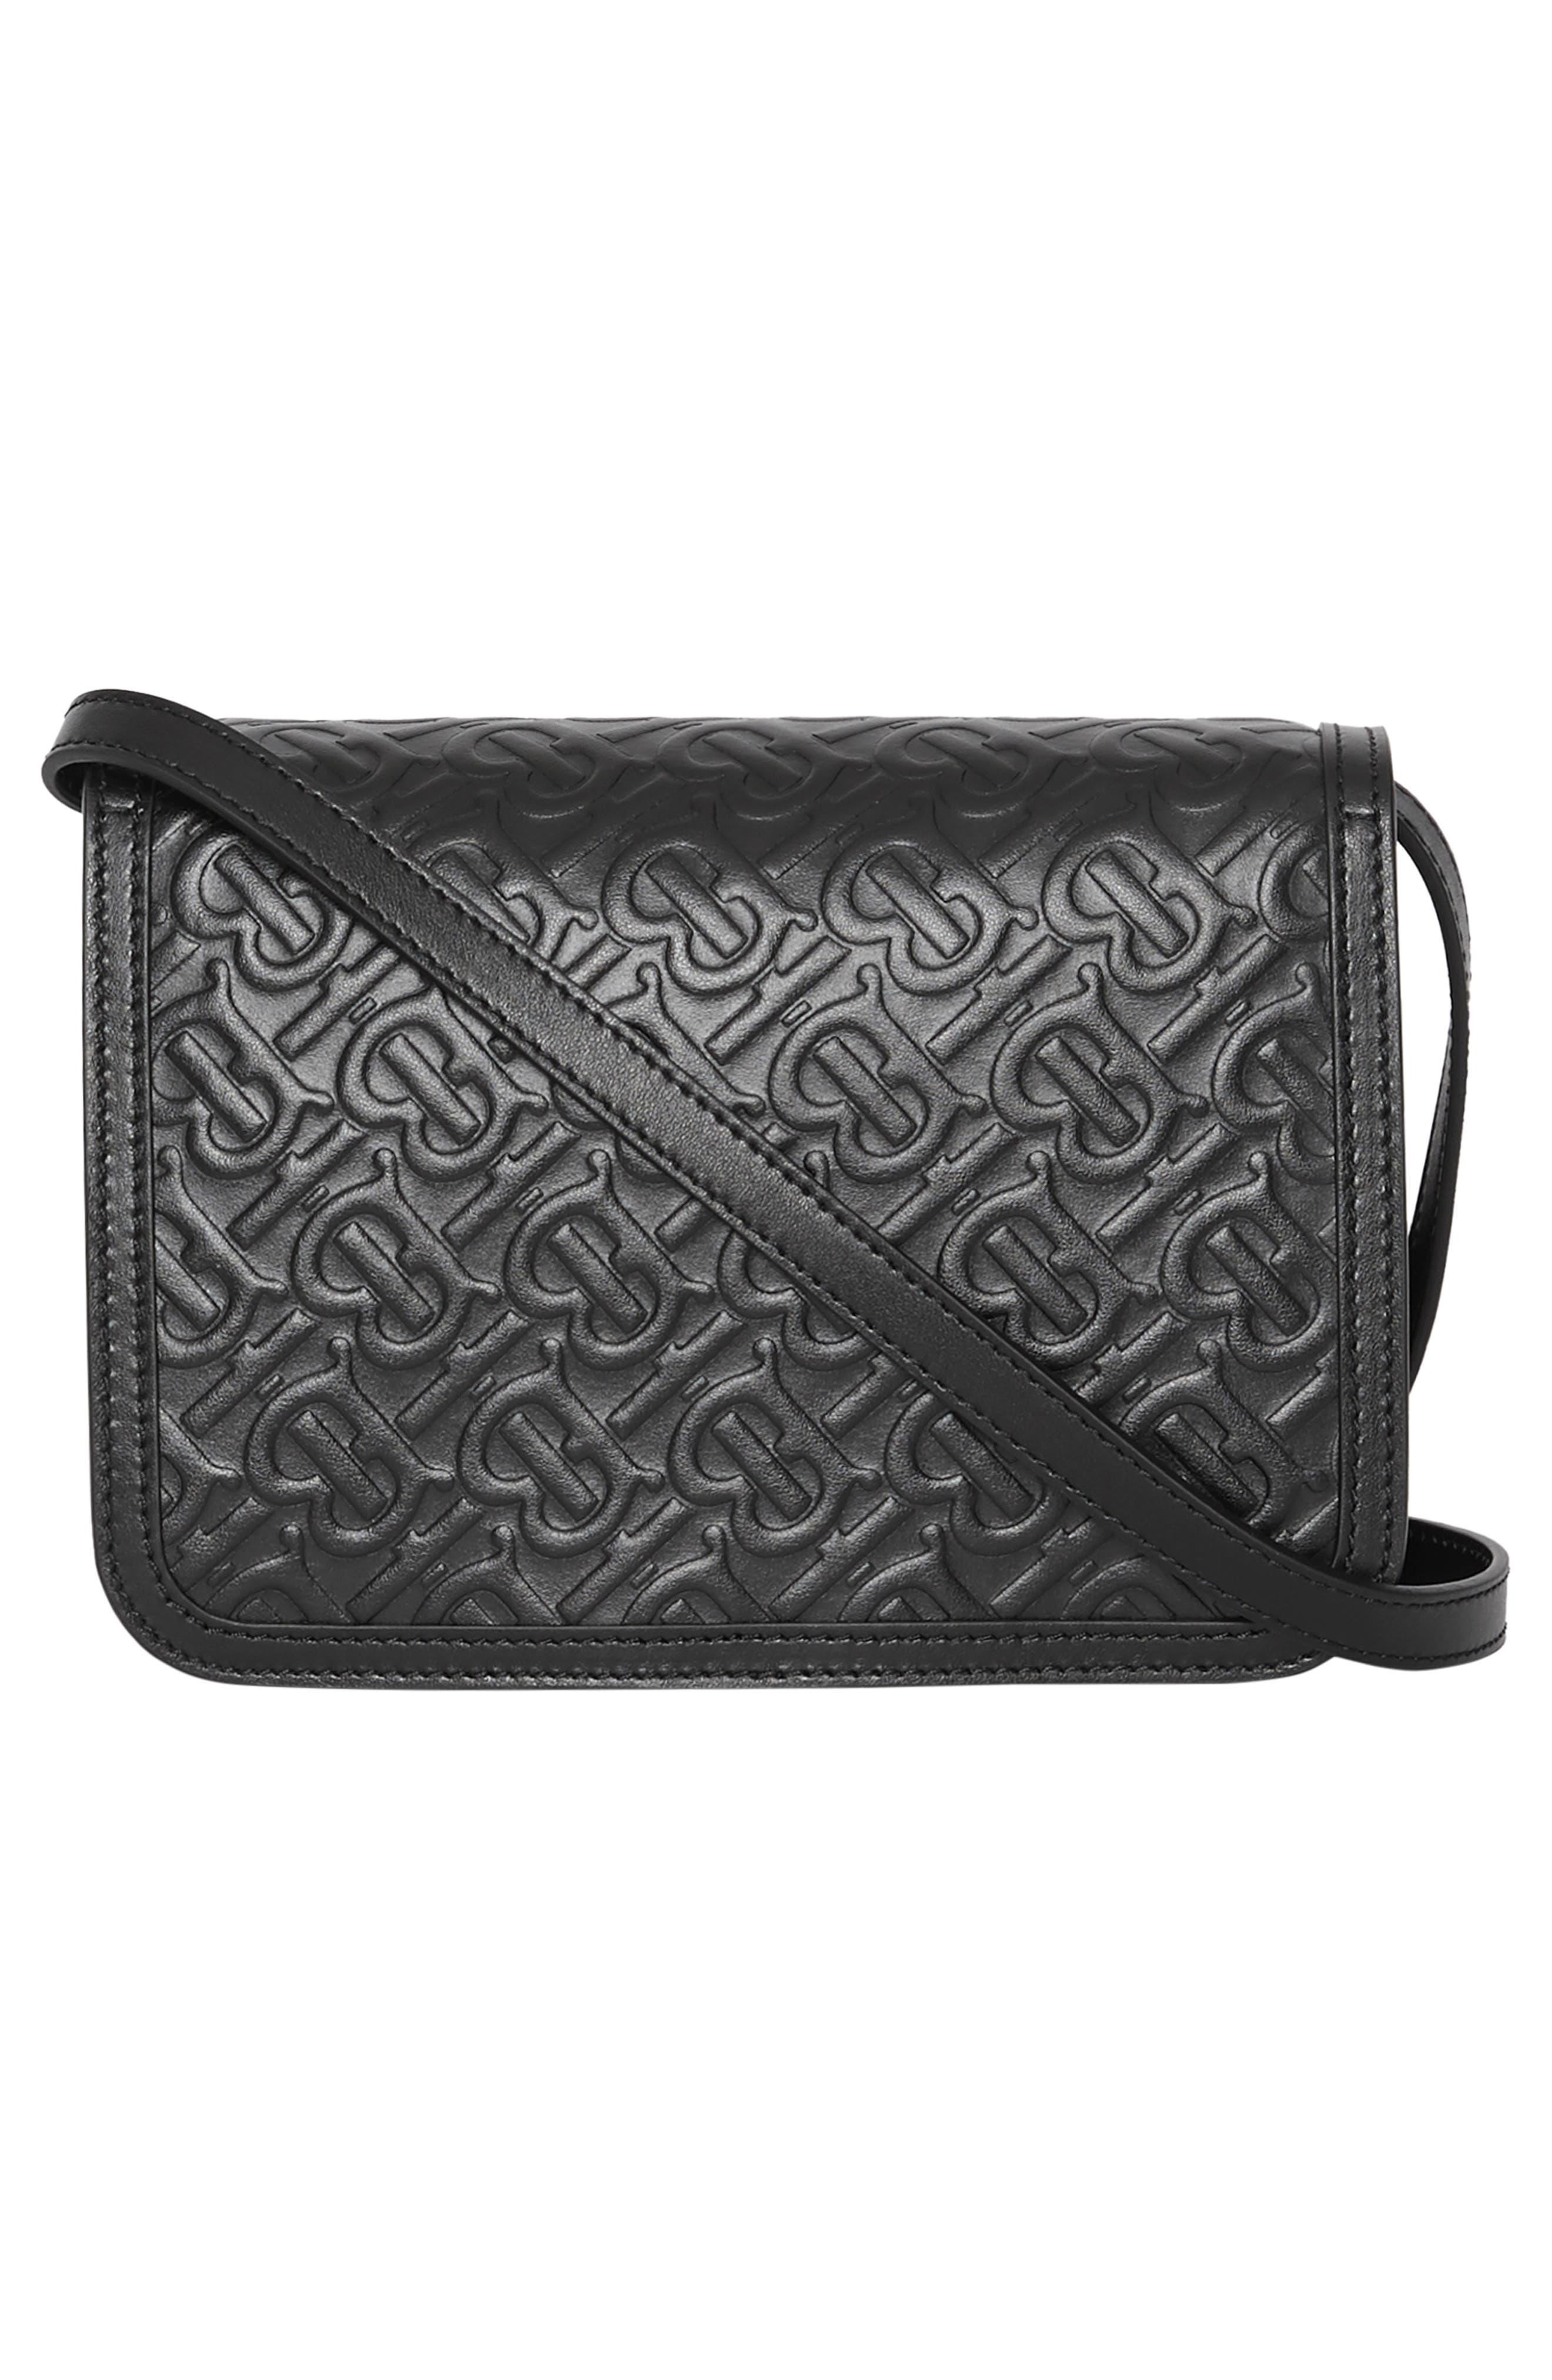 BURBERRY,                             Small Monogram Leather TB Bag,                             Alternate thumbnail 2, color,                             BLACK